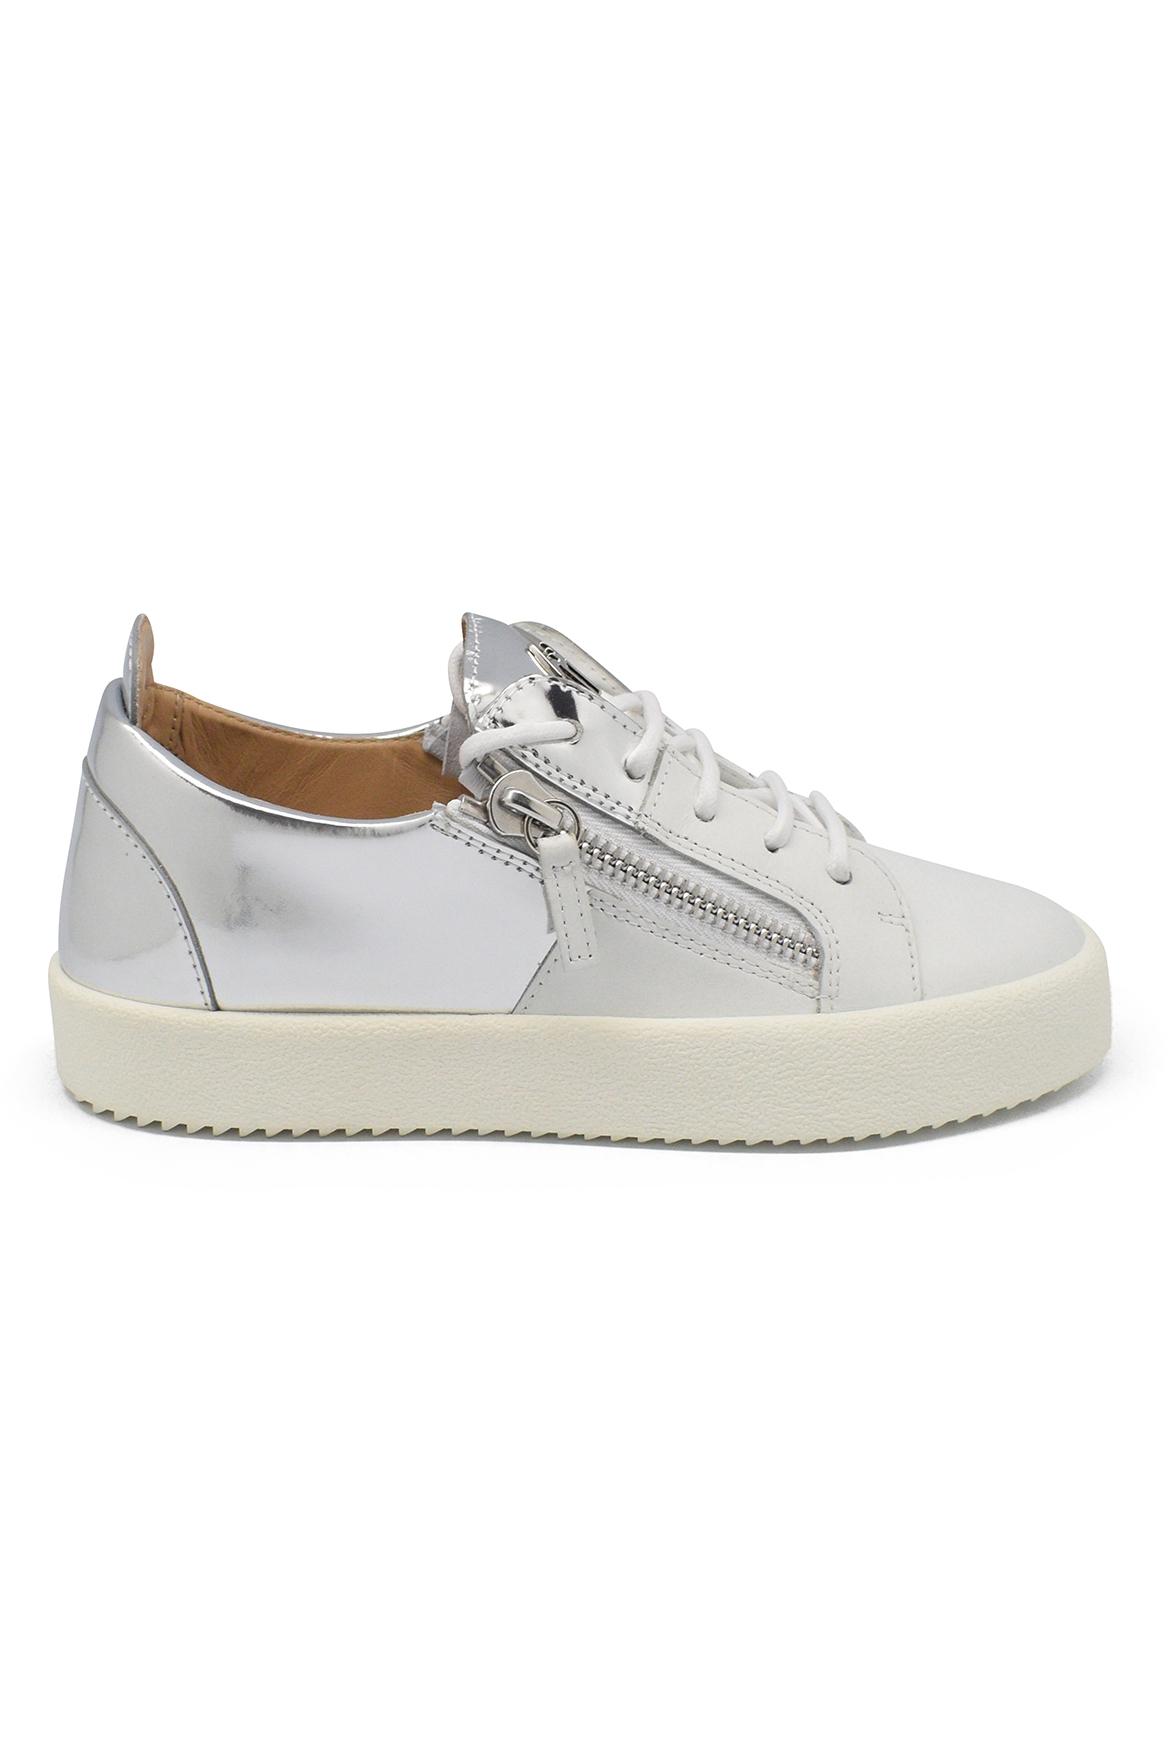 Sneakers Double - Giuseppe Zanotti - Modalova